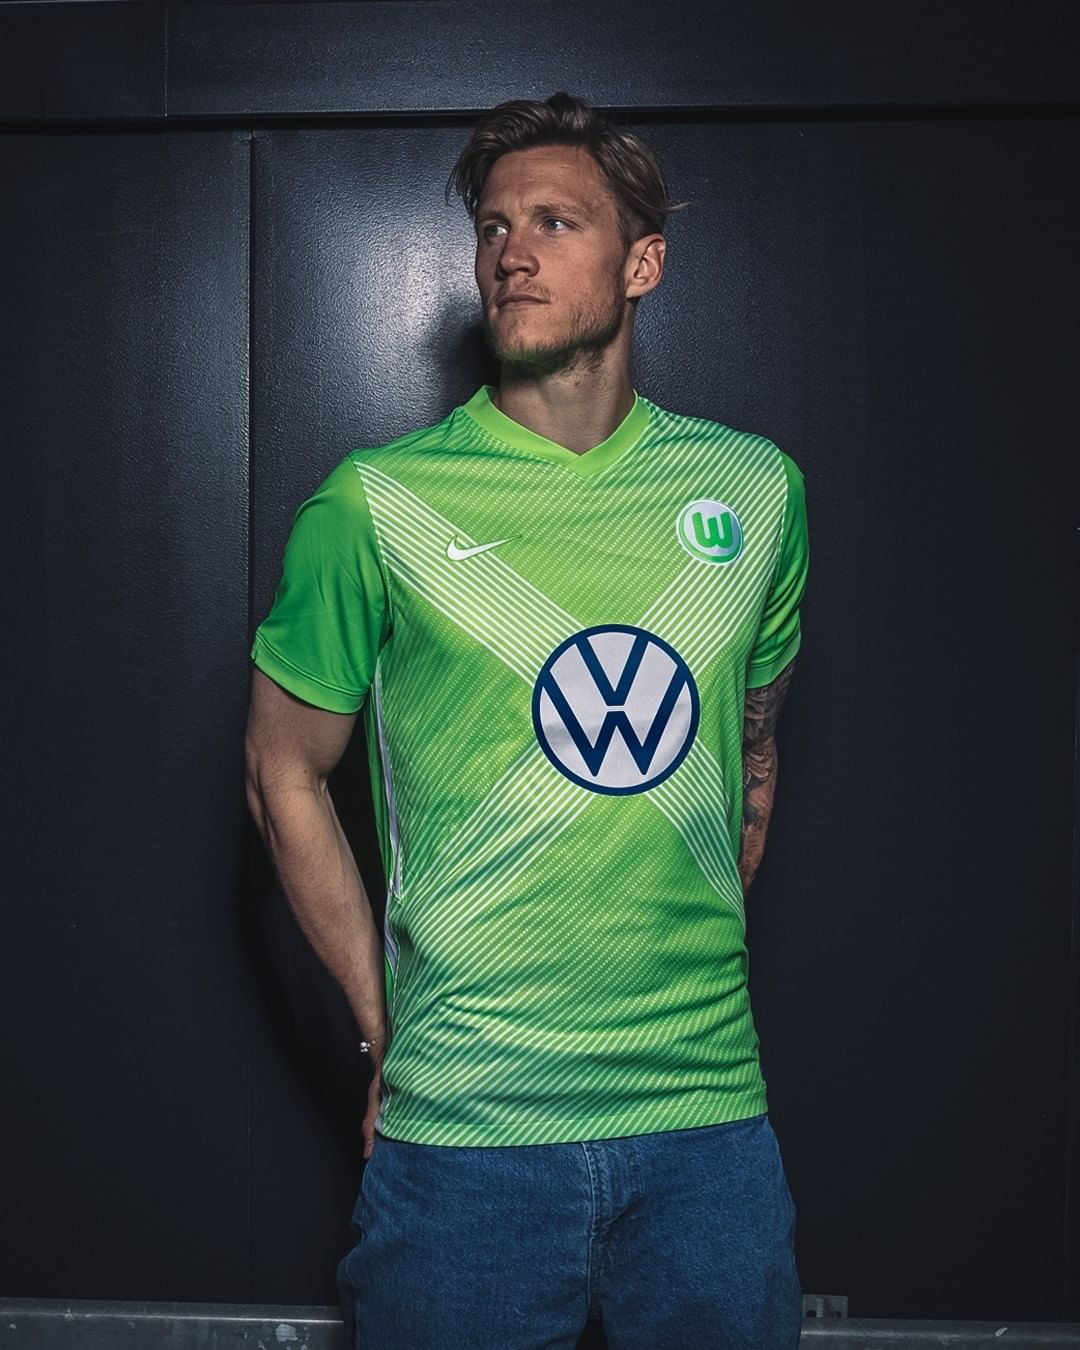 Vfl Wolfsburg Adventskalender 2021